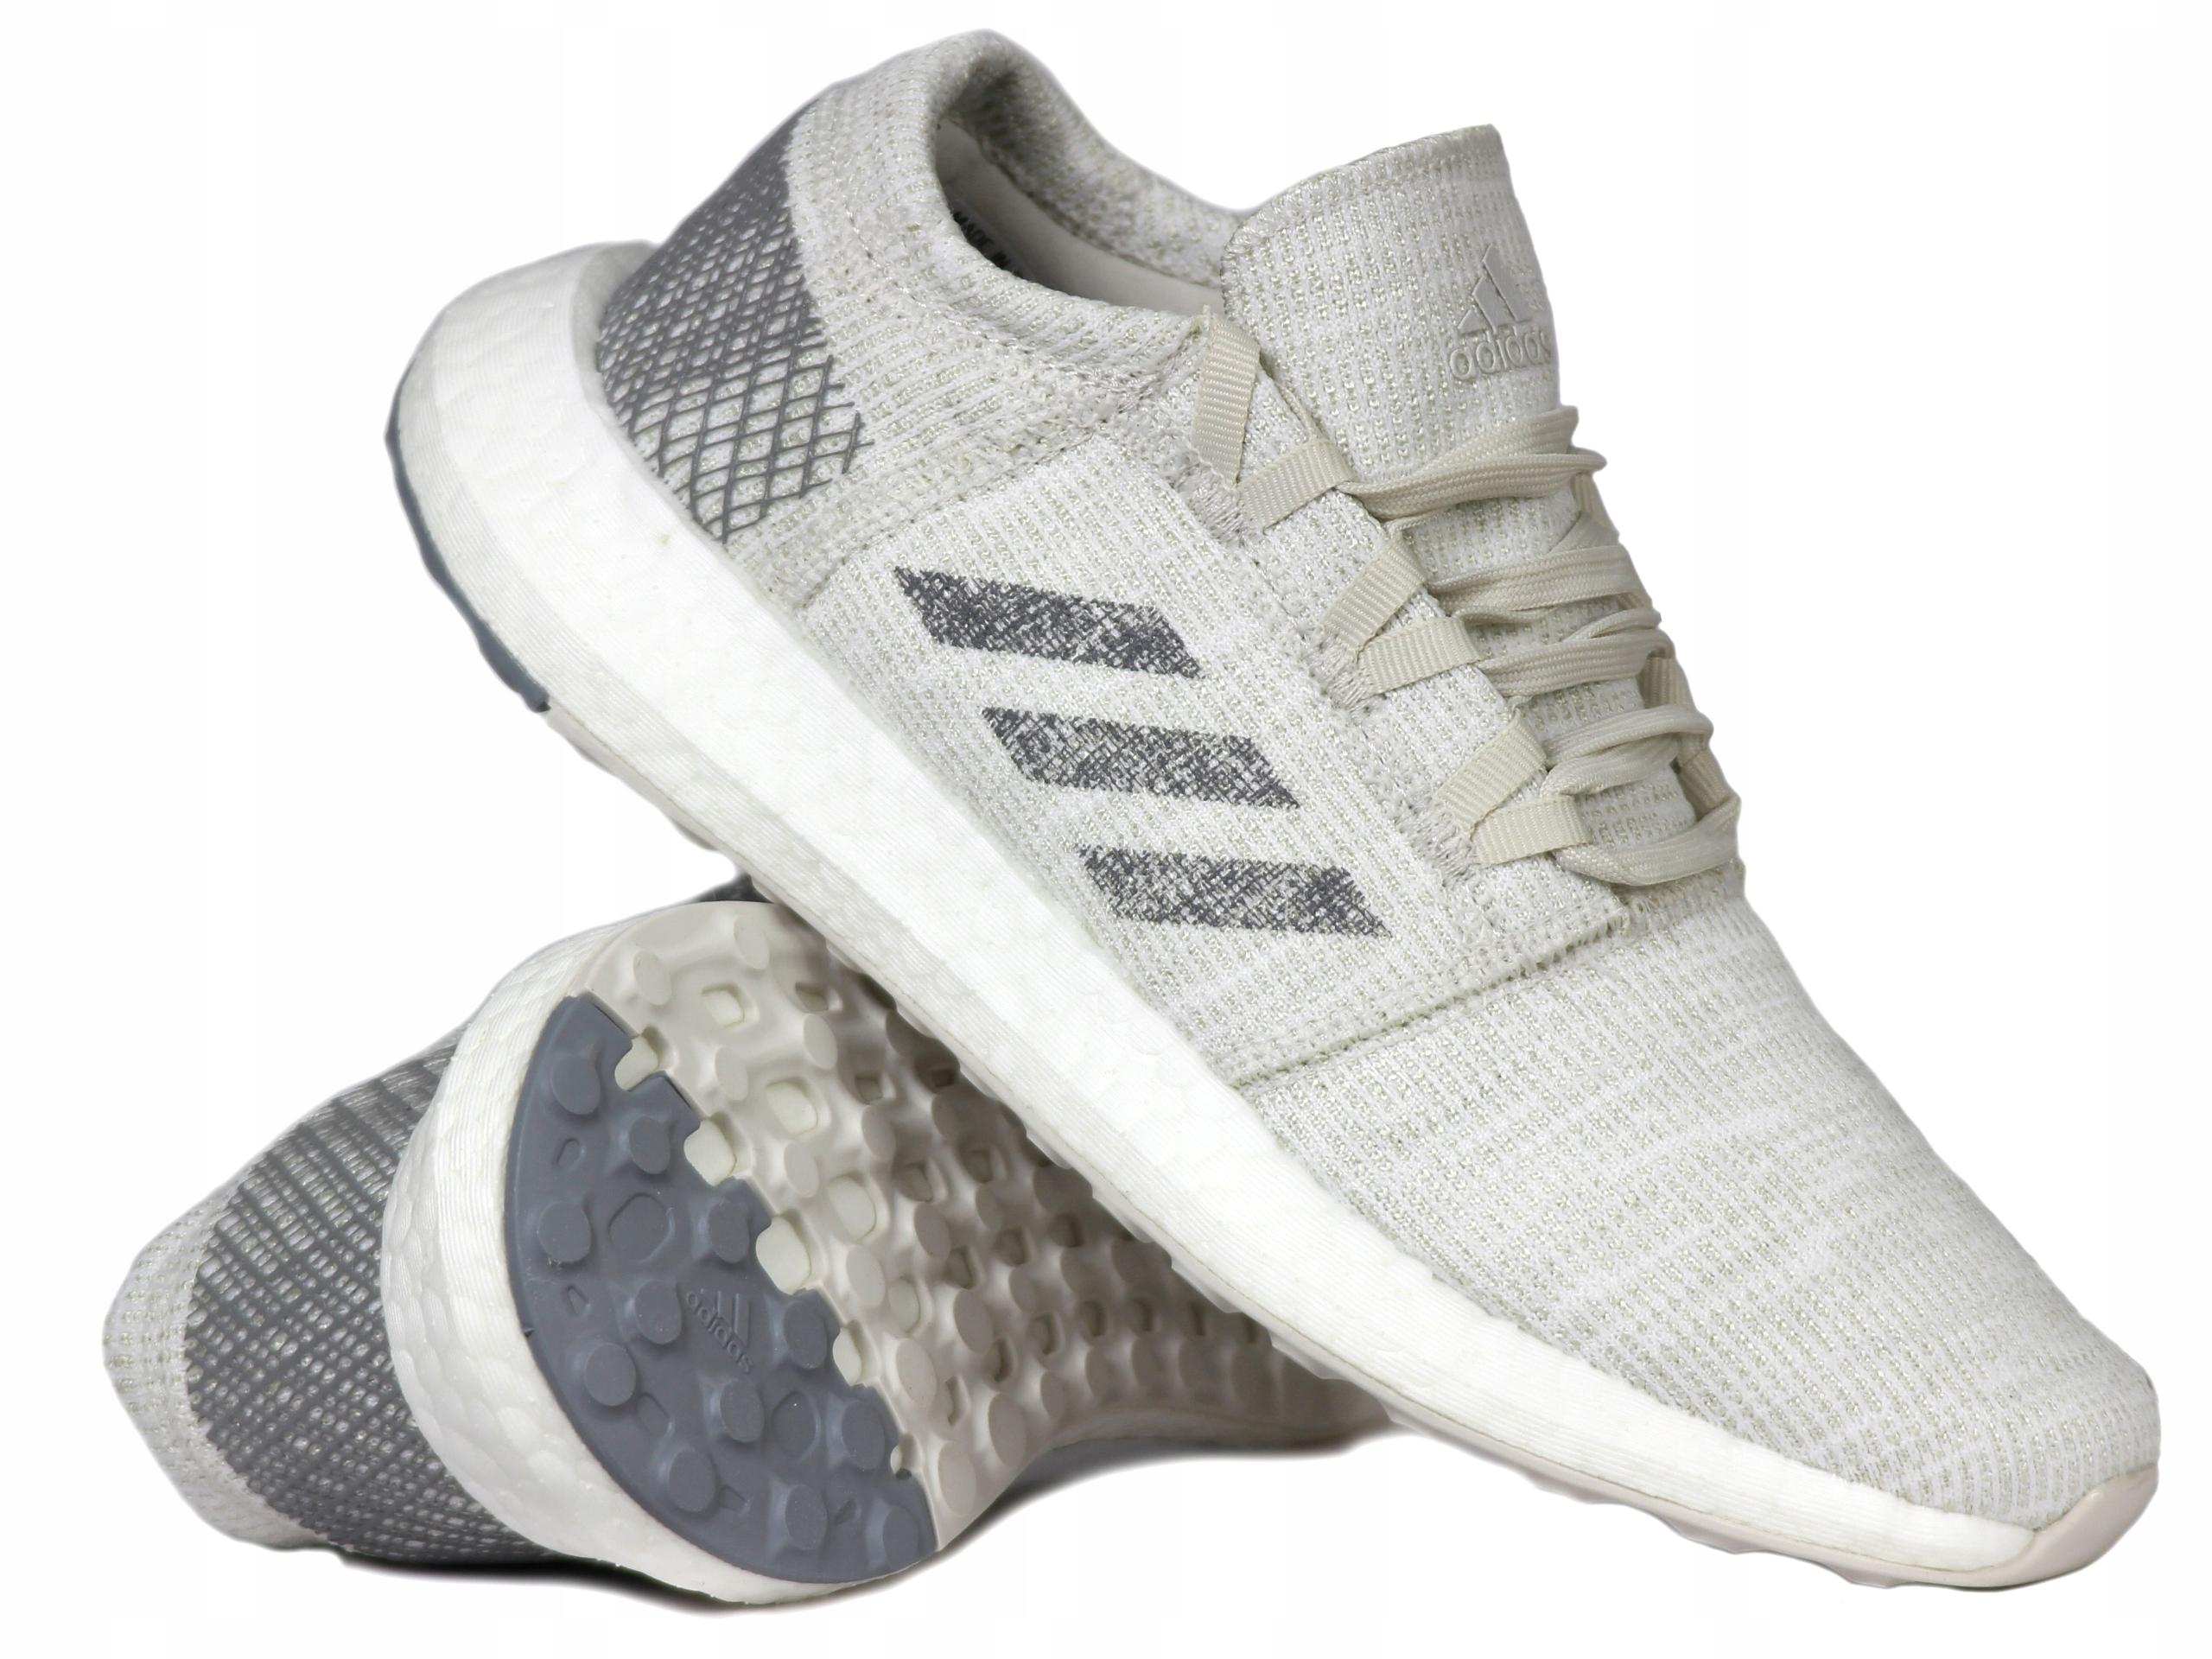 BUTY ADIDAS PUREBOOST GO (B75821) | Mens Adidas | Kicks